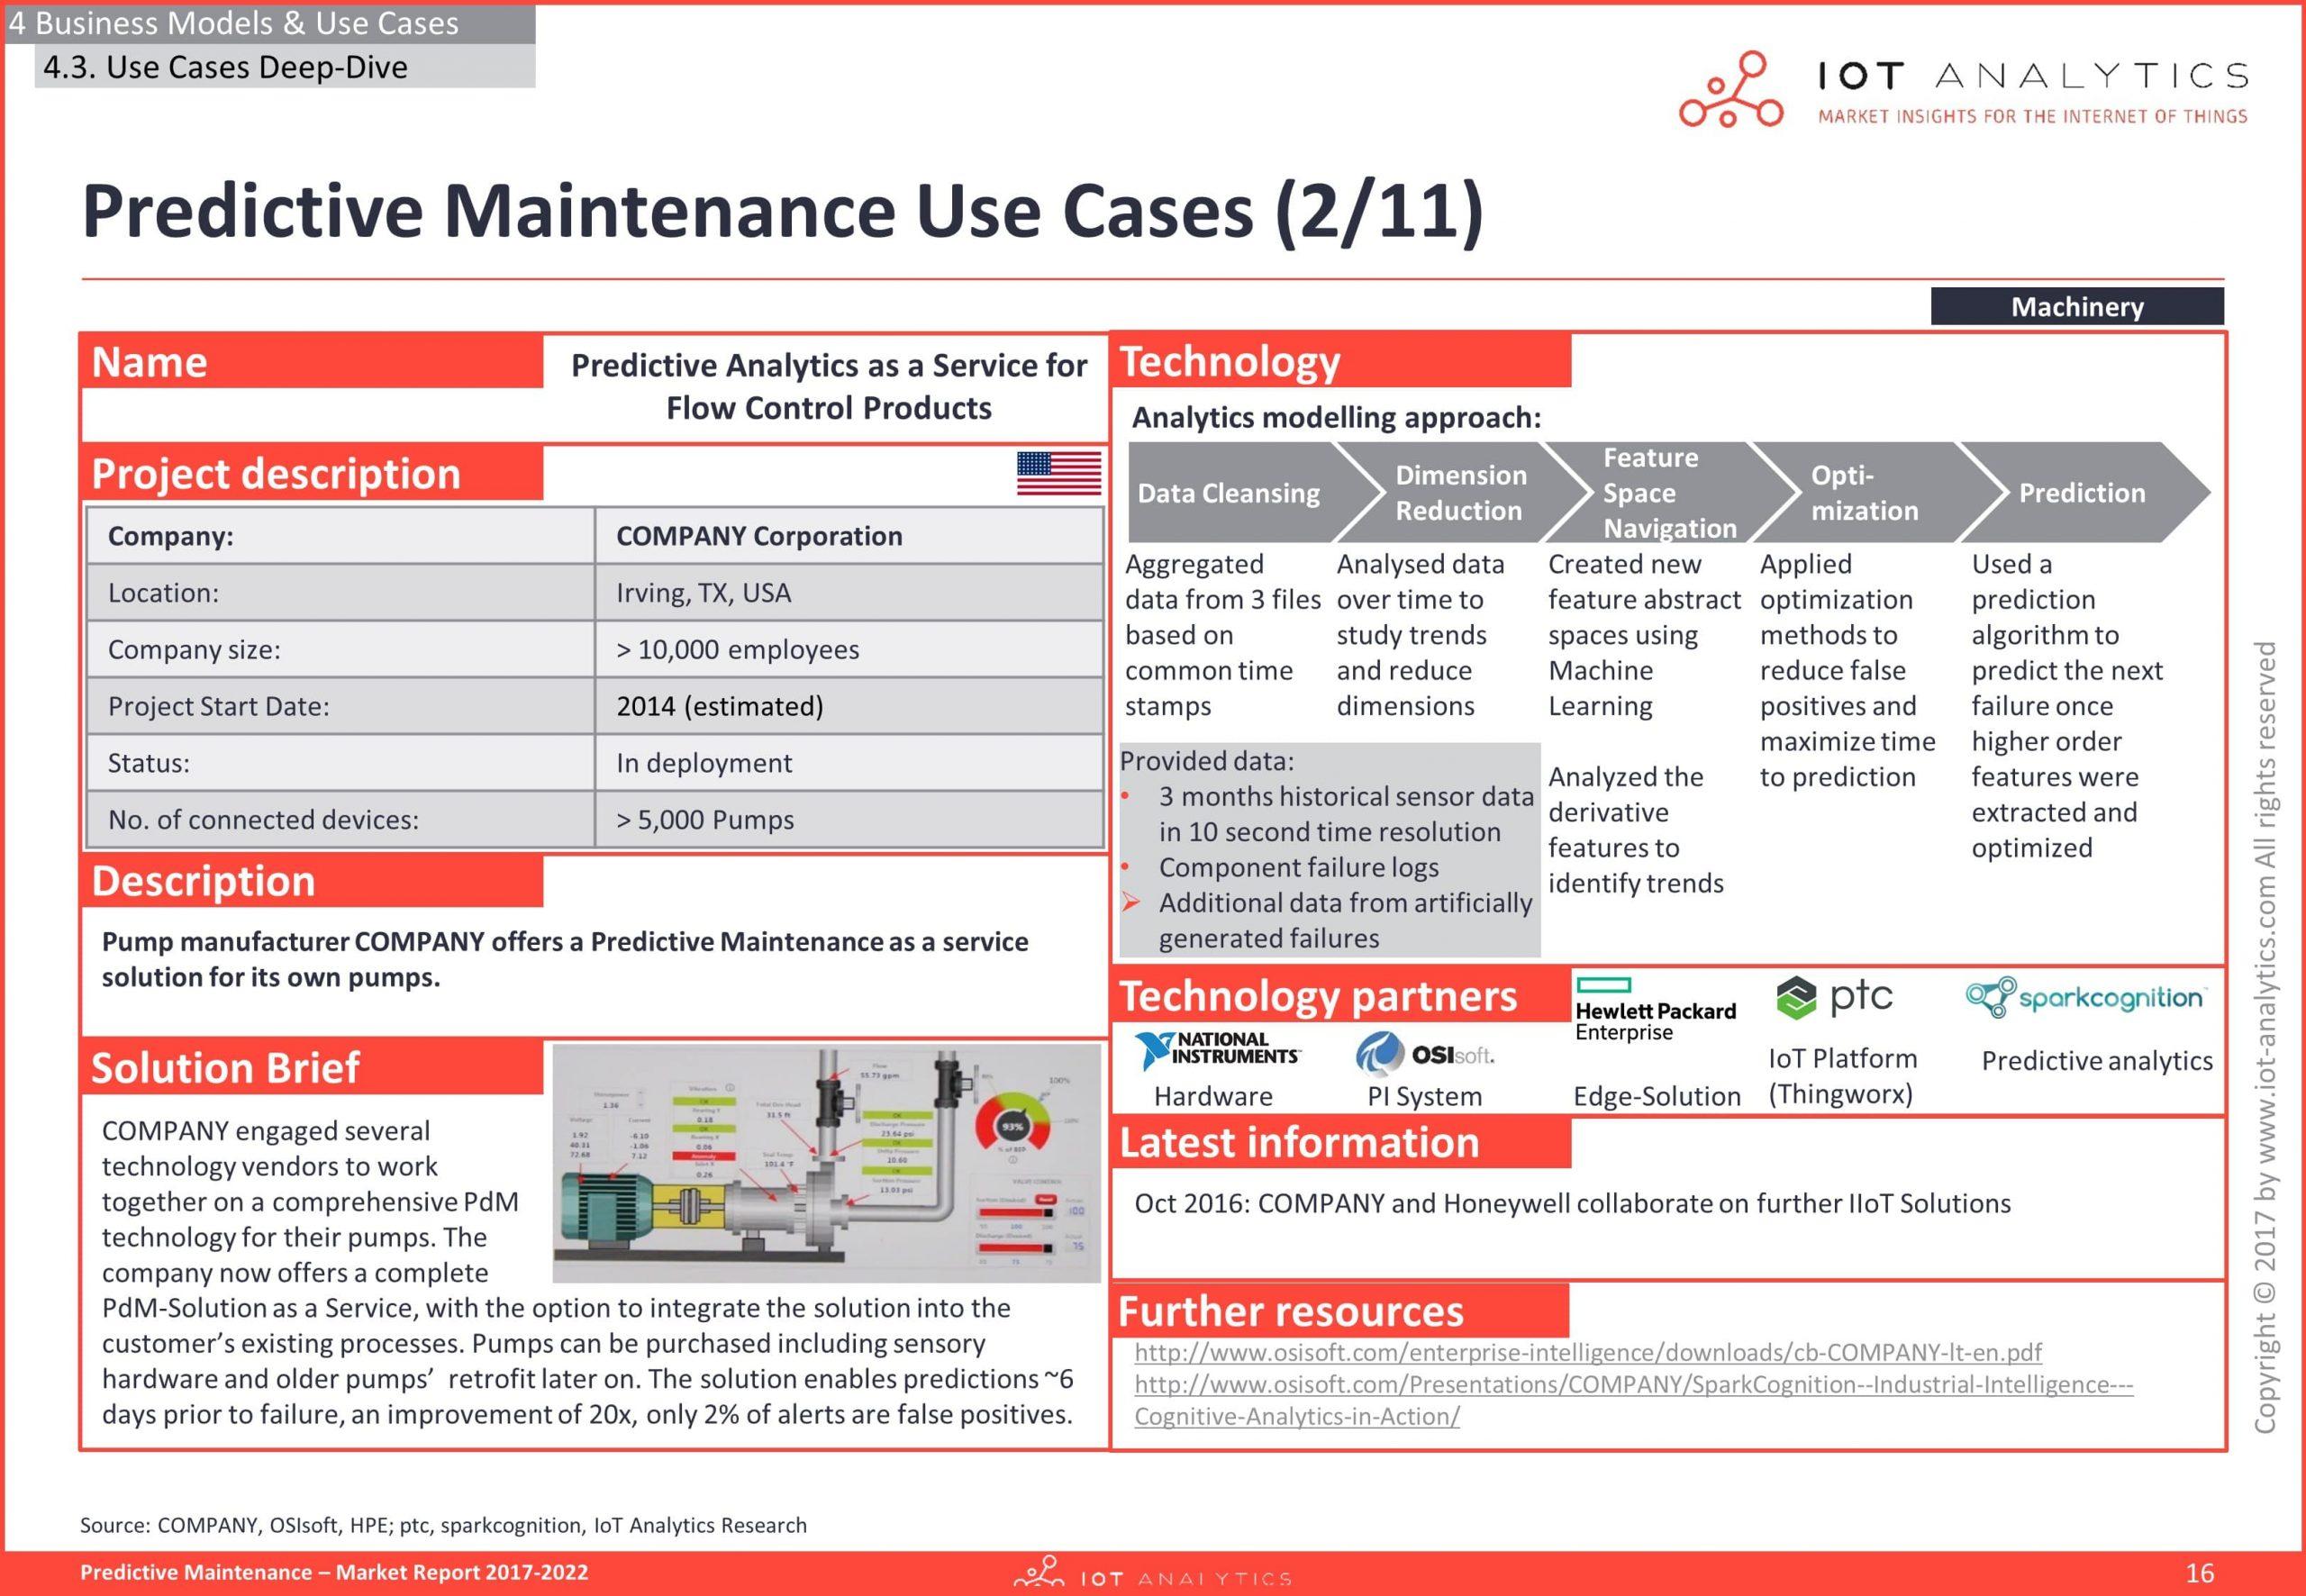 Predictive Maintenance Use Case